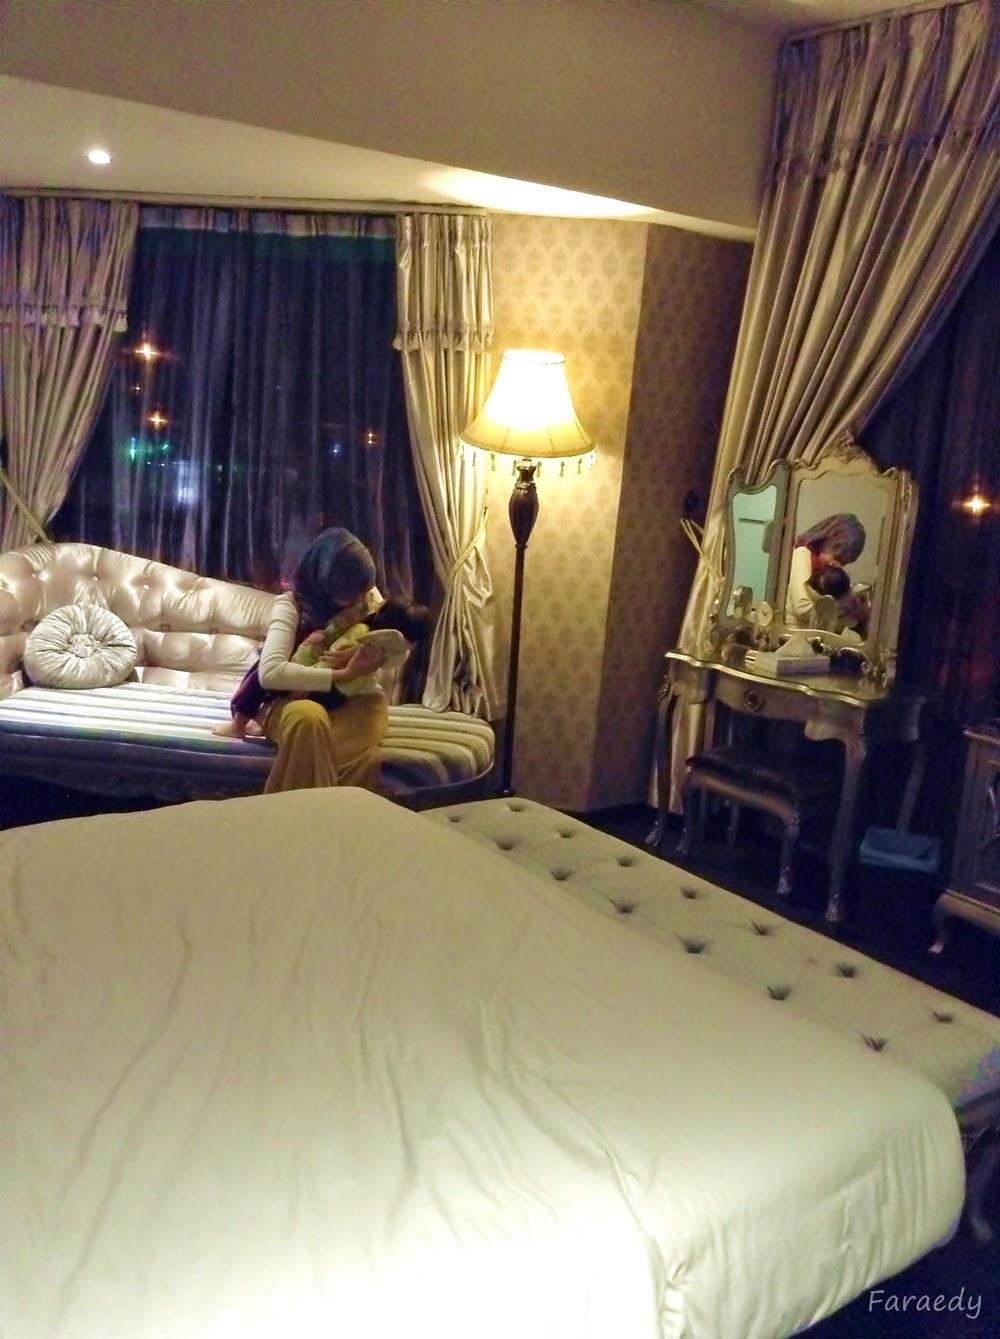 Murah Naaaa Sekali Sampai Dia Upgrade Honeymoon Suite Alhamdulillah Rezeki Di Pagi Hari Sebab Kul 1pagi Zzzzz Bilik Sangat Ok Dan Cantik